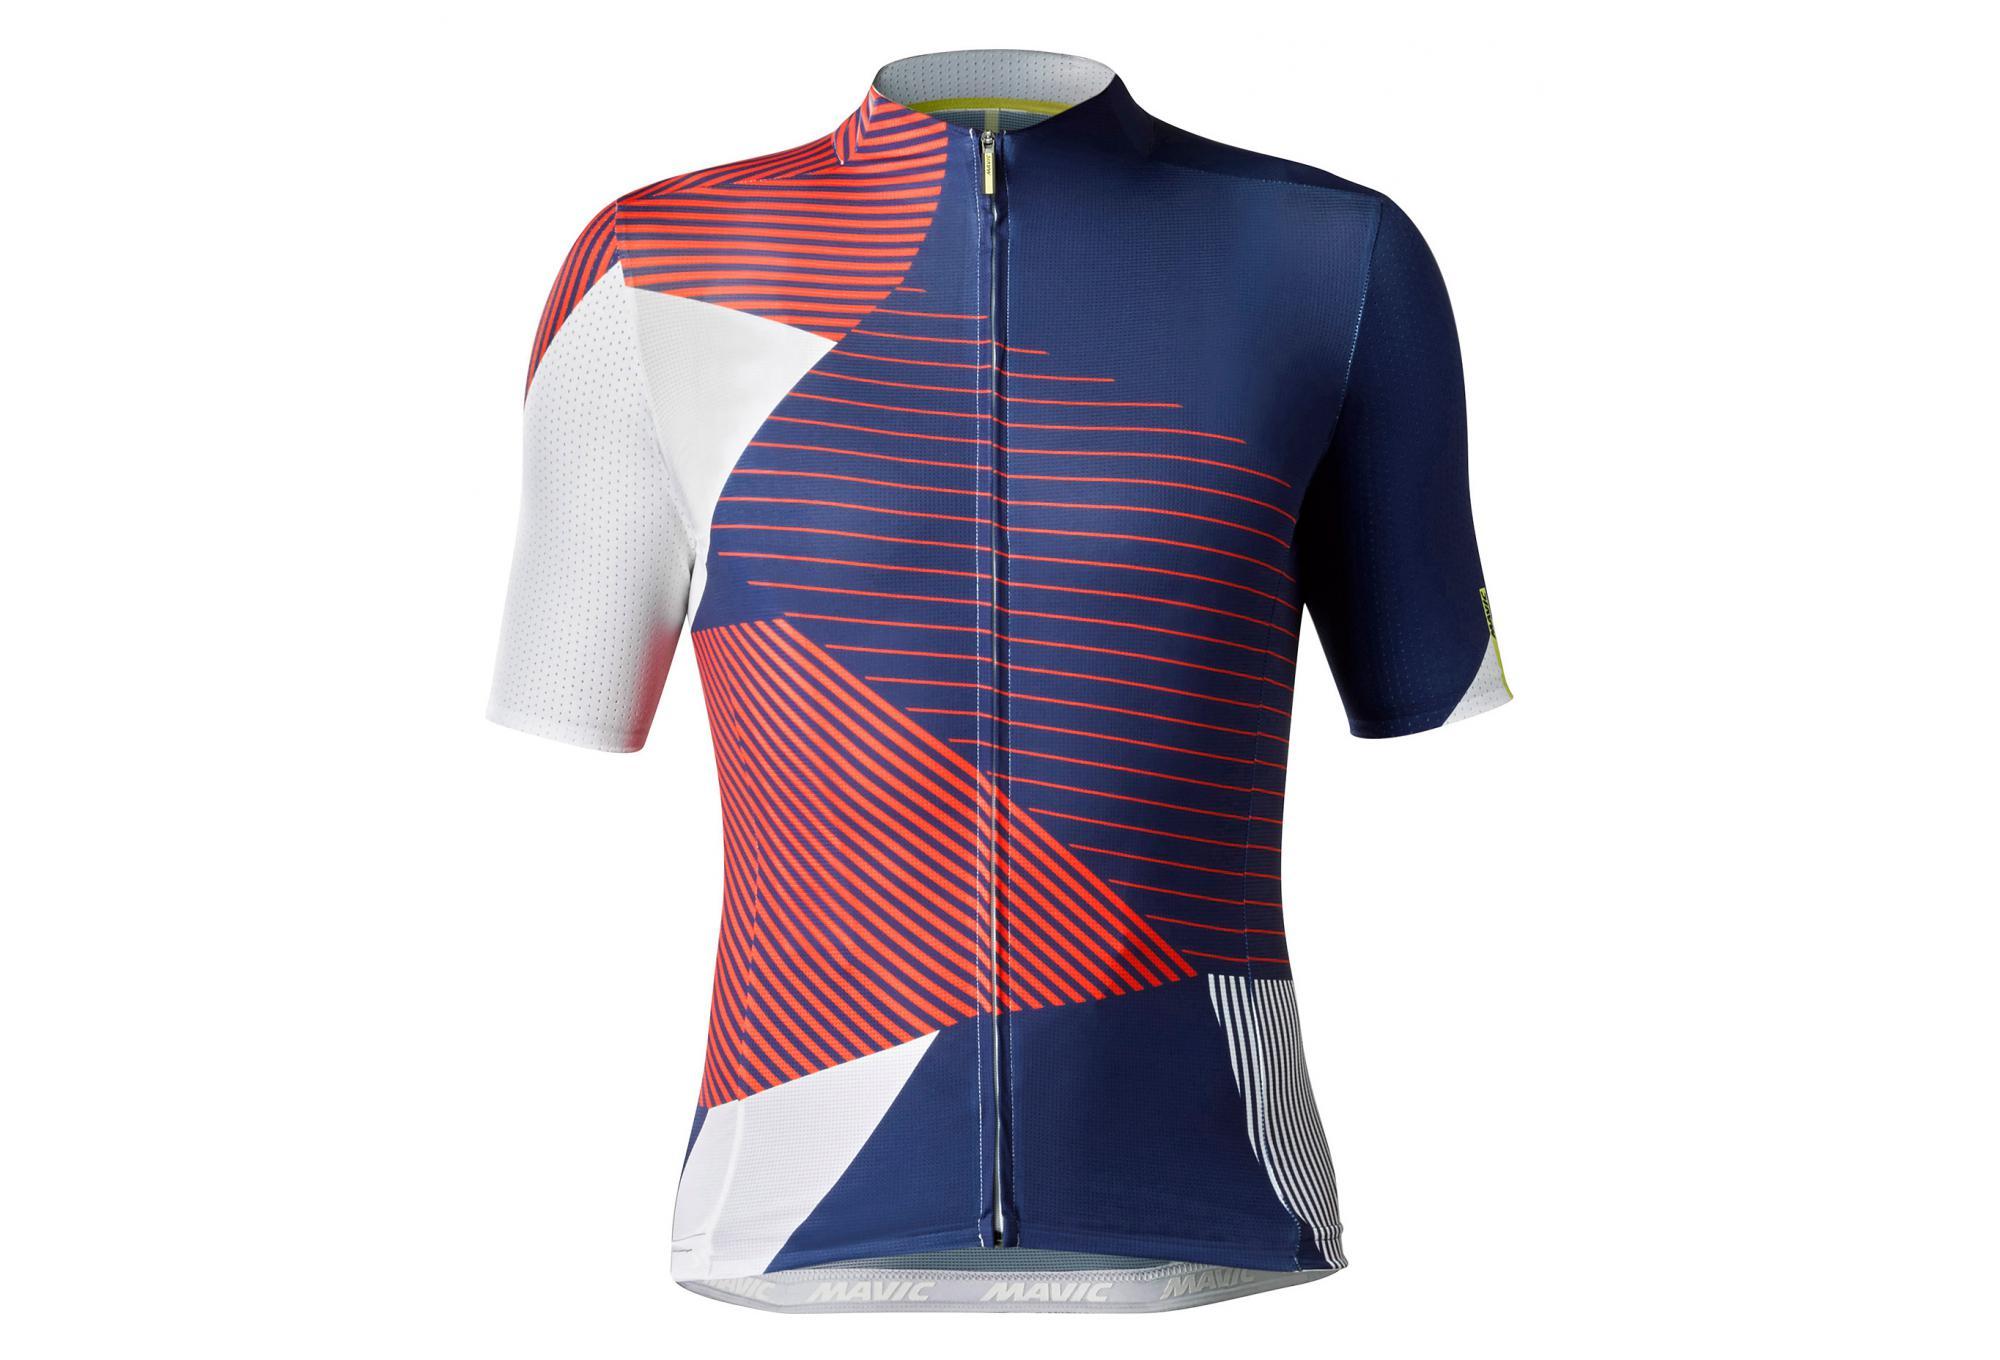 Short Sleeves Jersey MAVIC 2018 Cosmic Limited Edition Allure ... 93bb3c95e